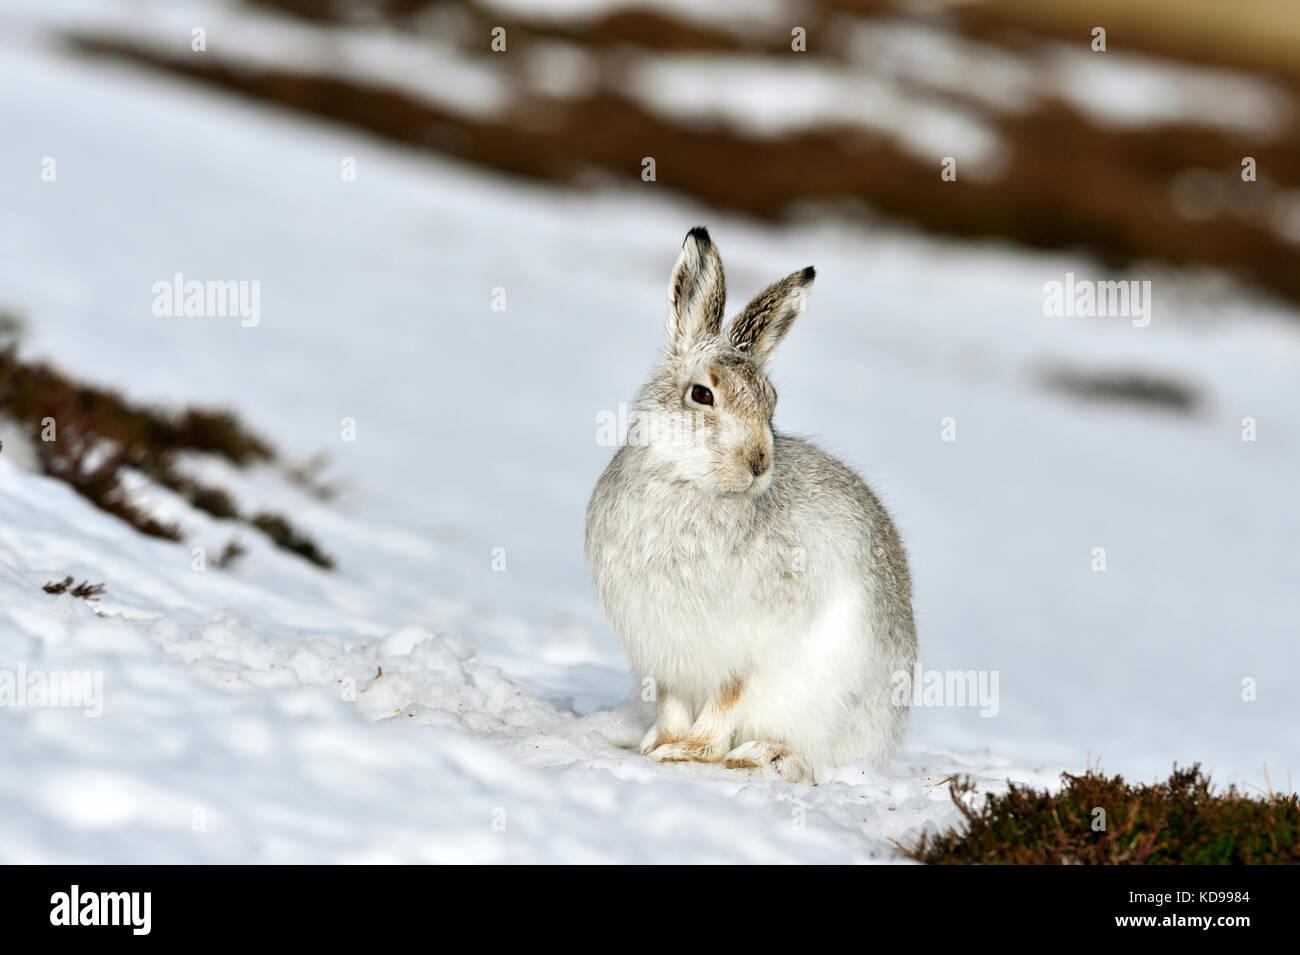 Mountain hare (Lepus timidus) UK - Stock Image